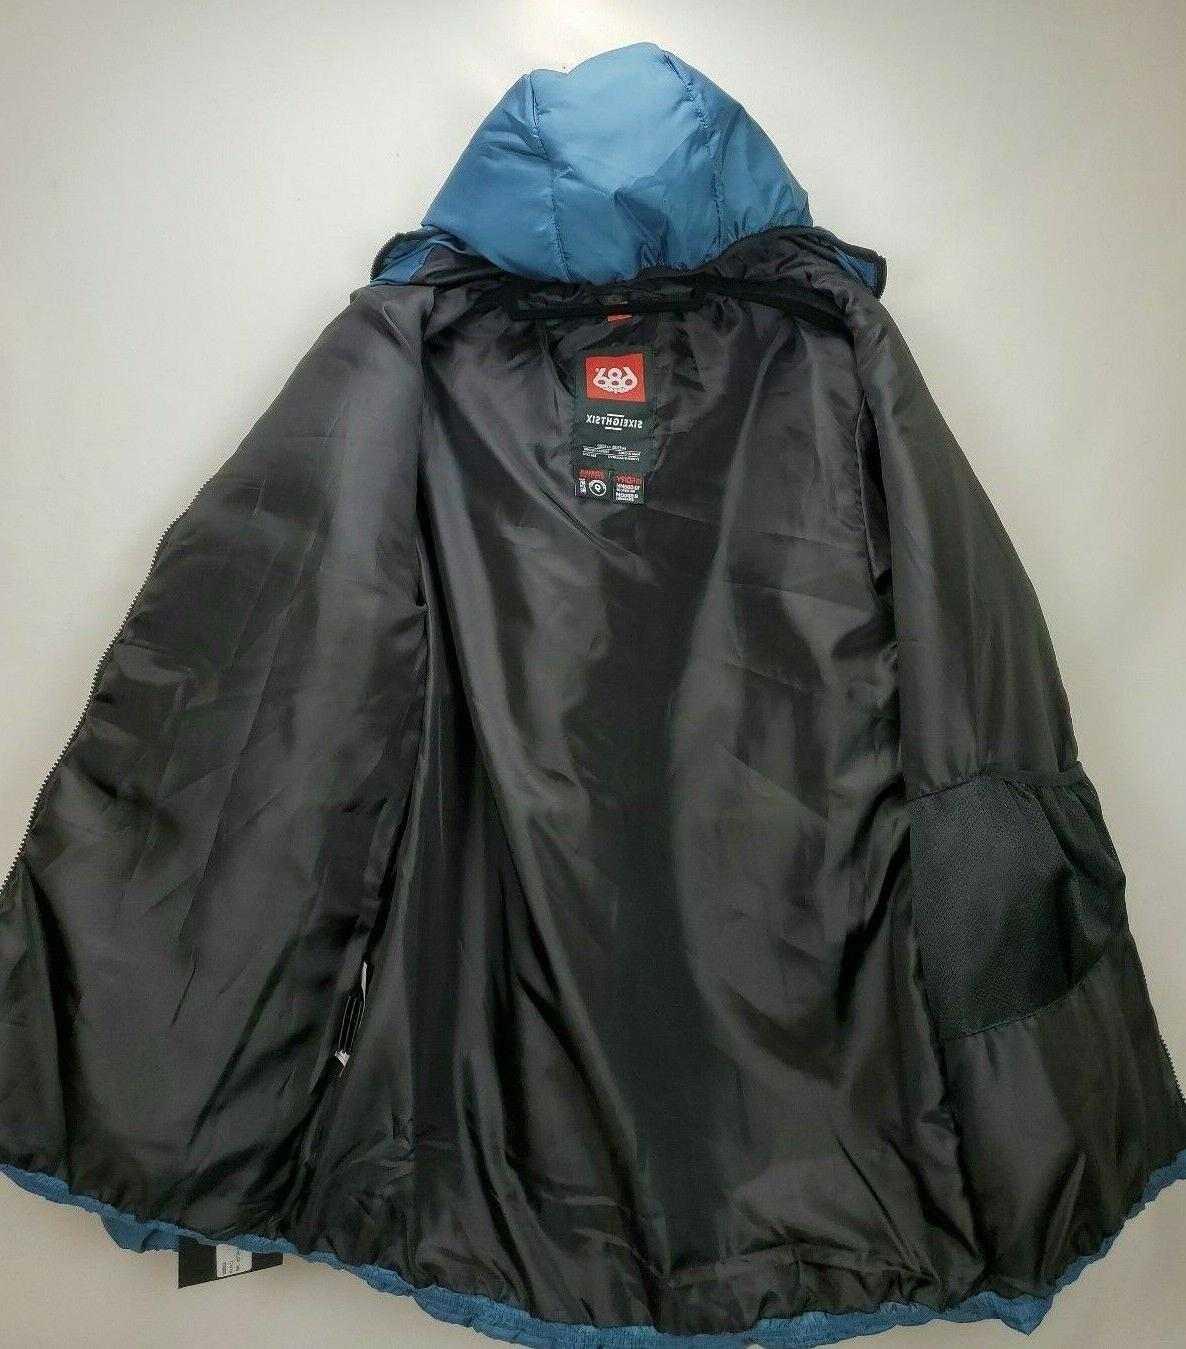 686 Snowboard Large Blue Waterproof